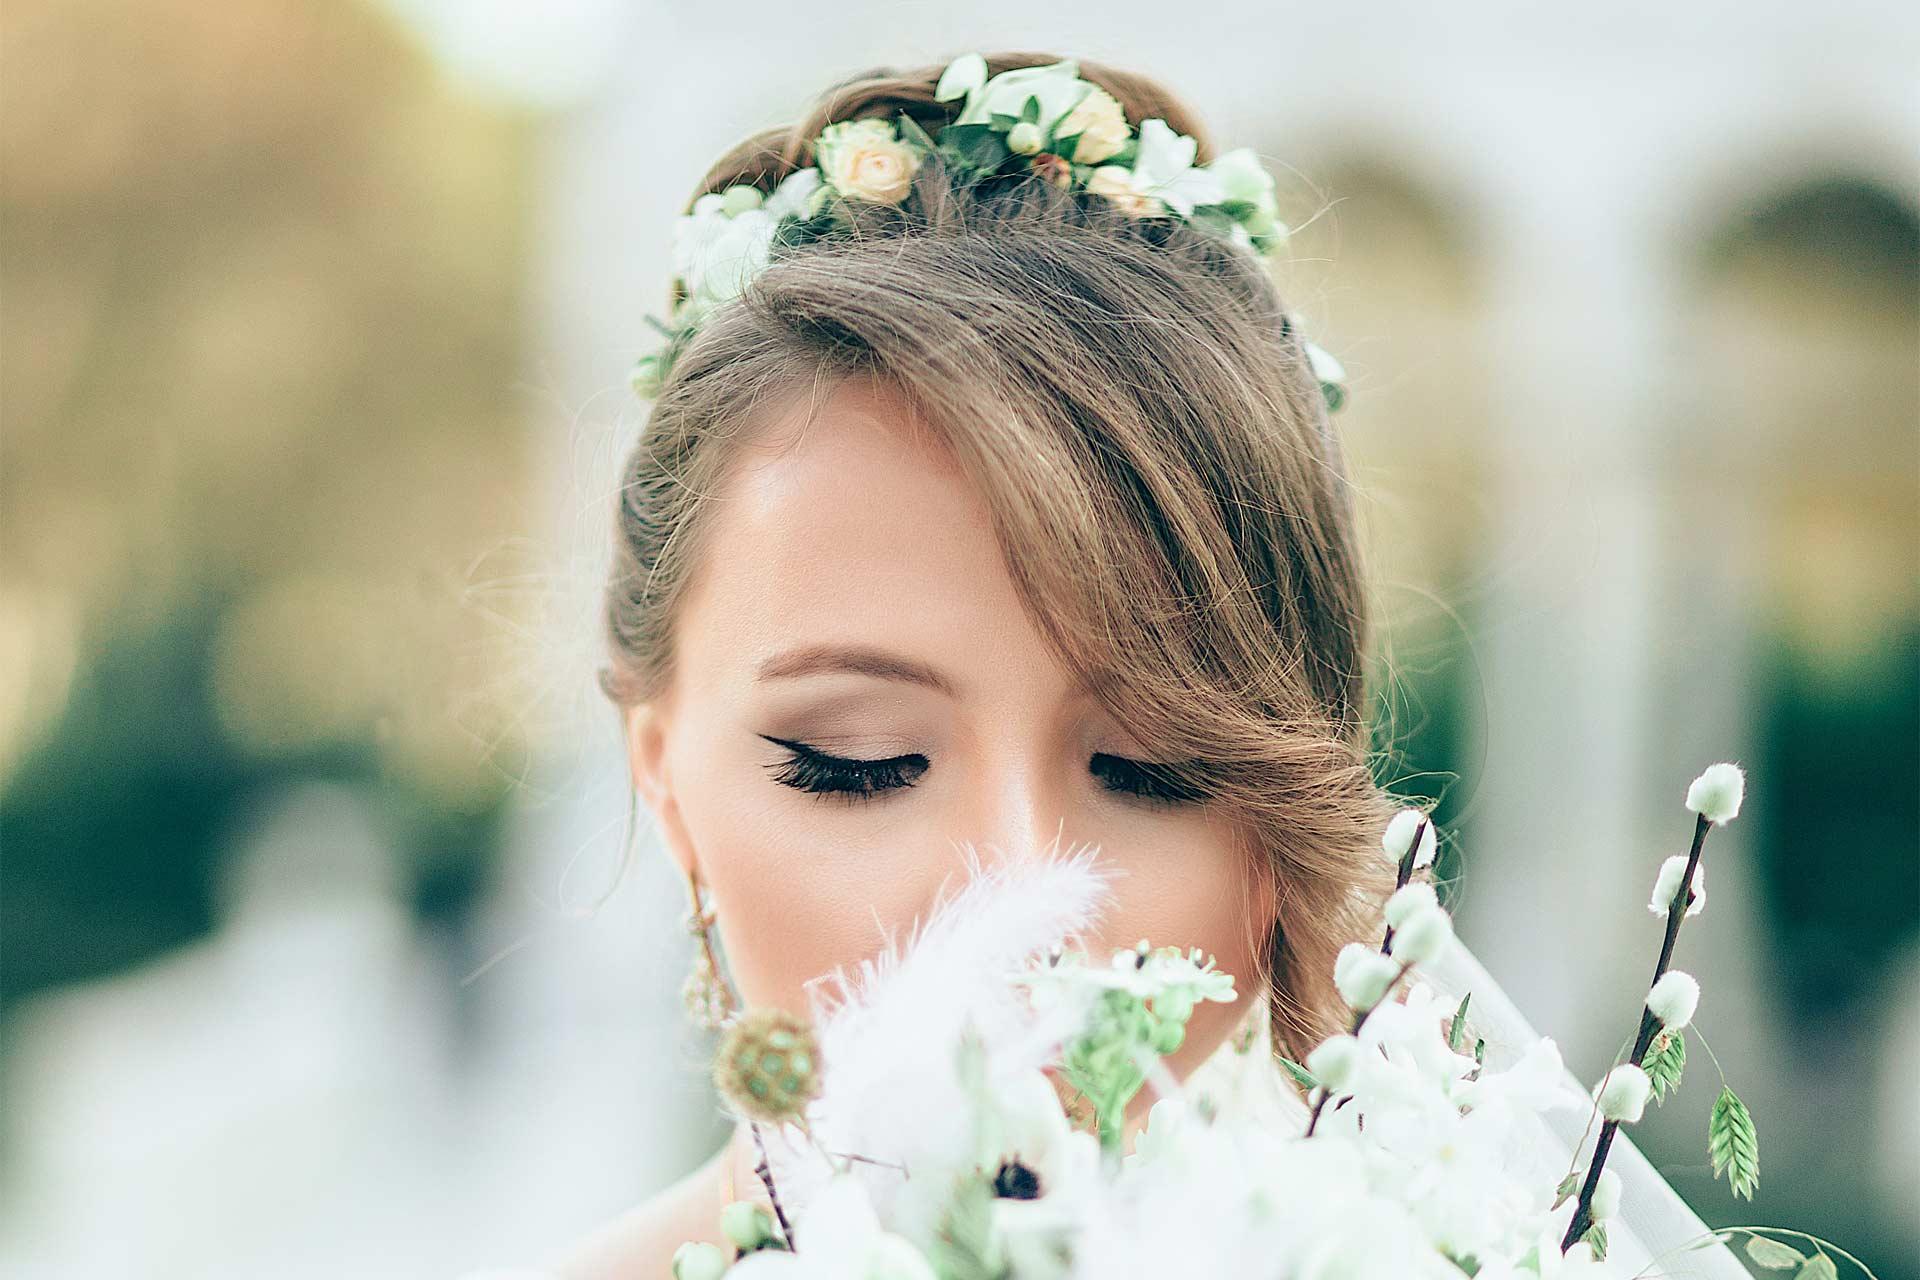 Maquillage de mariage